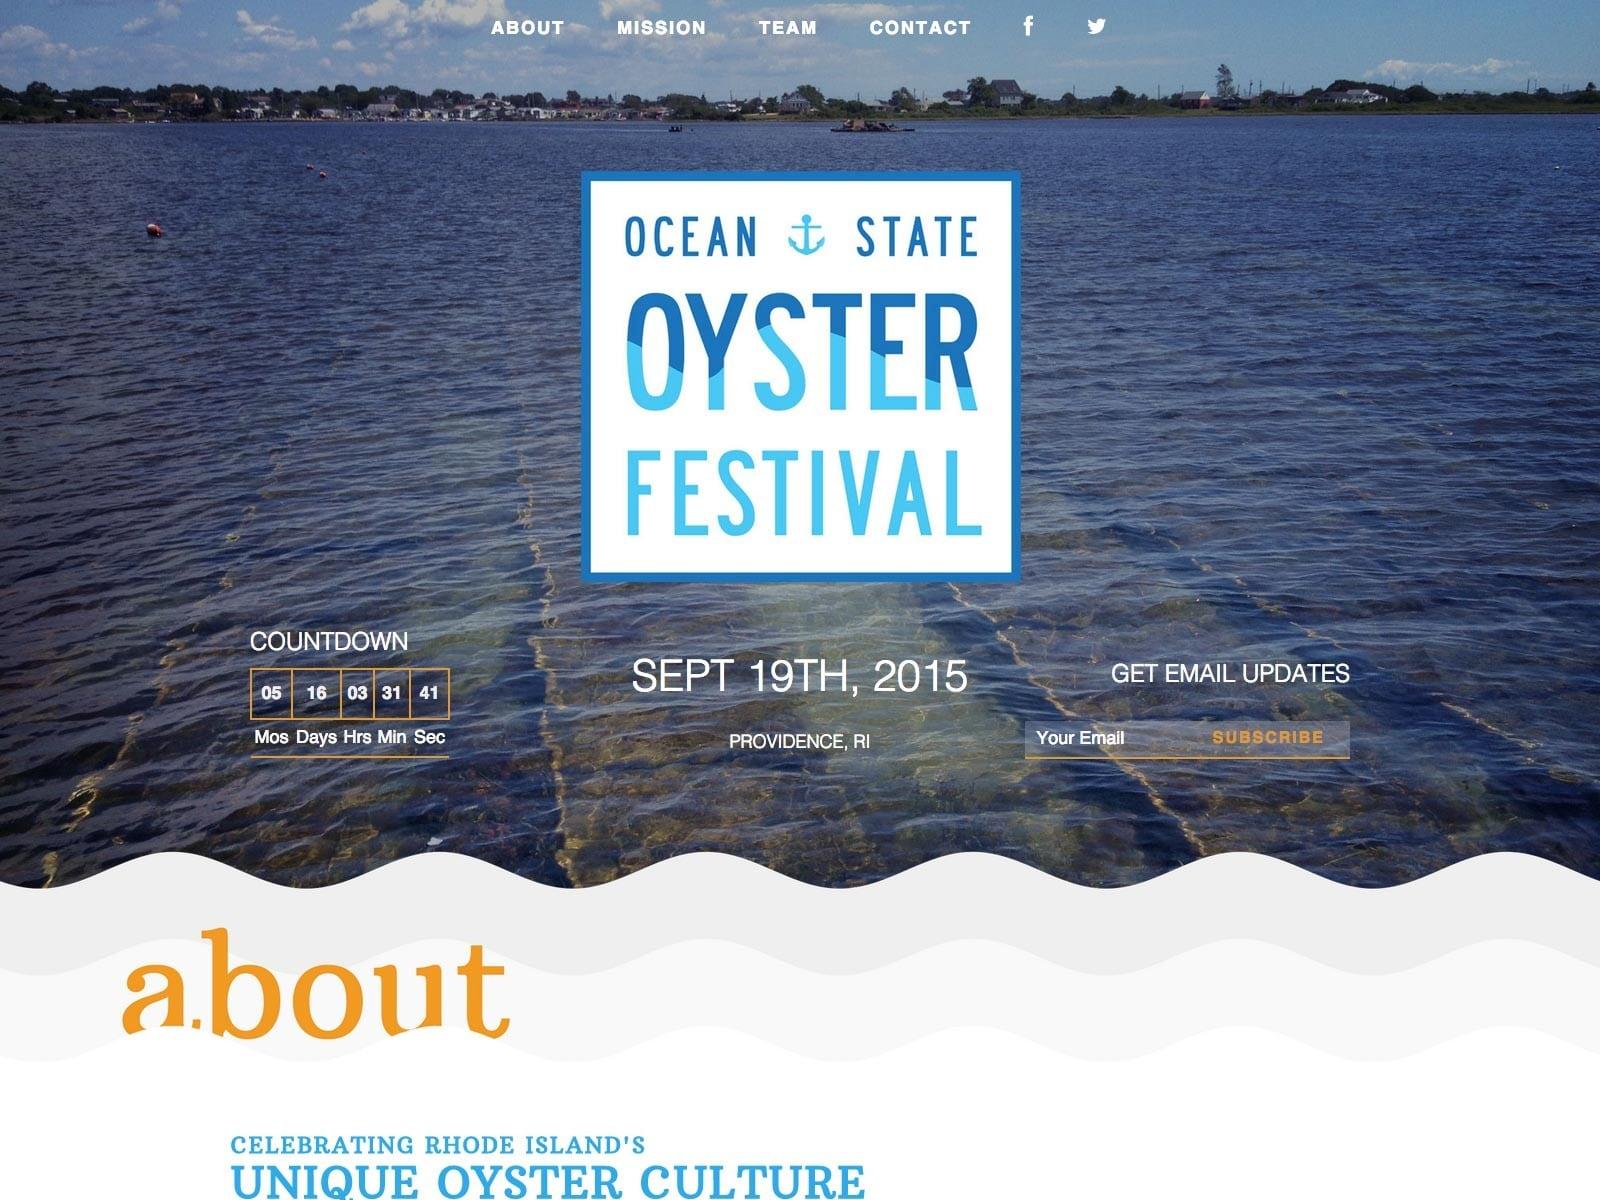 ocean-state-oyster-festival-screenshot-1